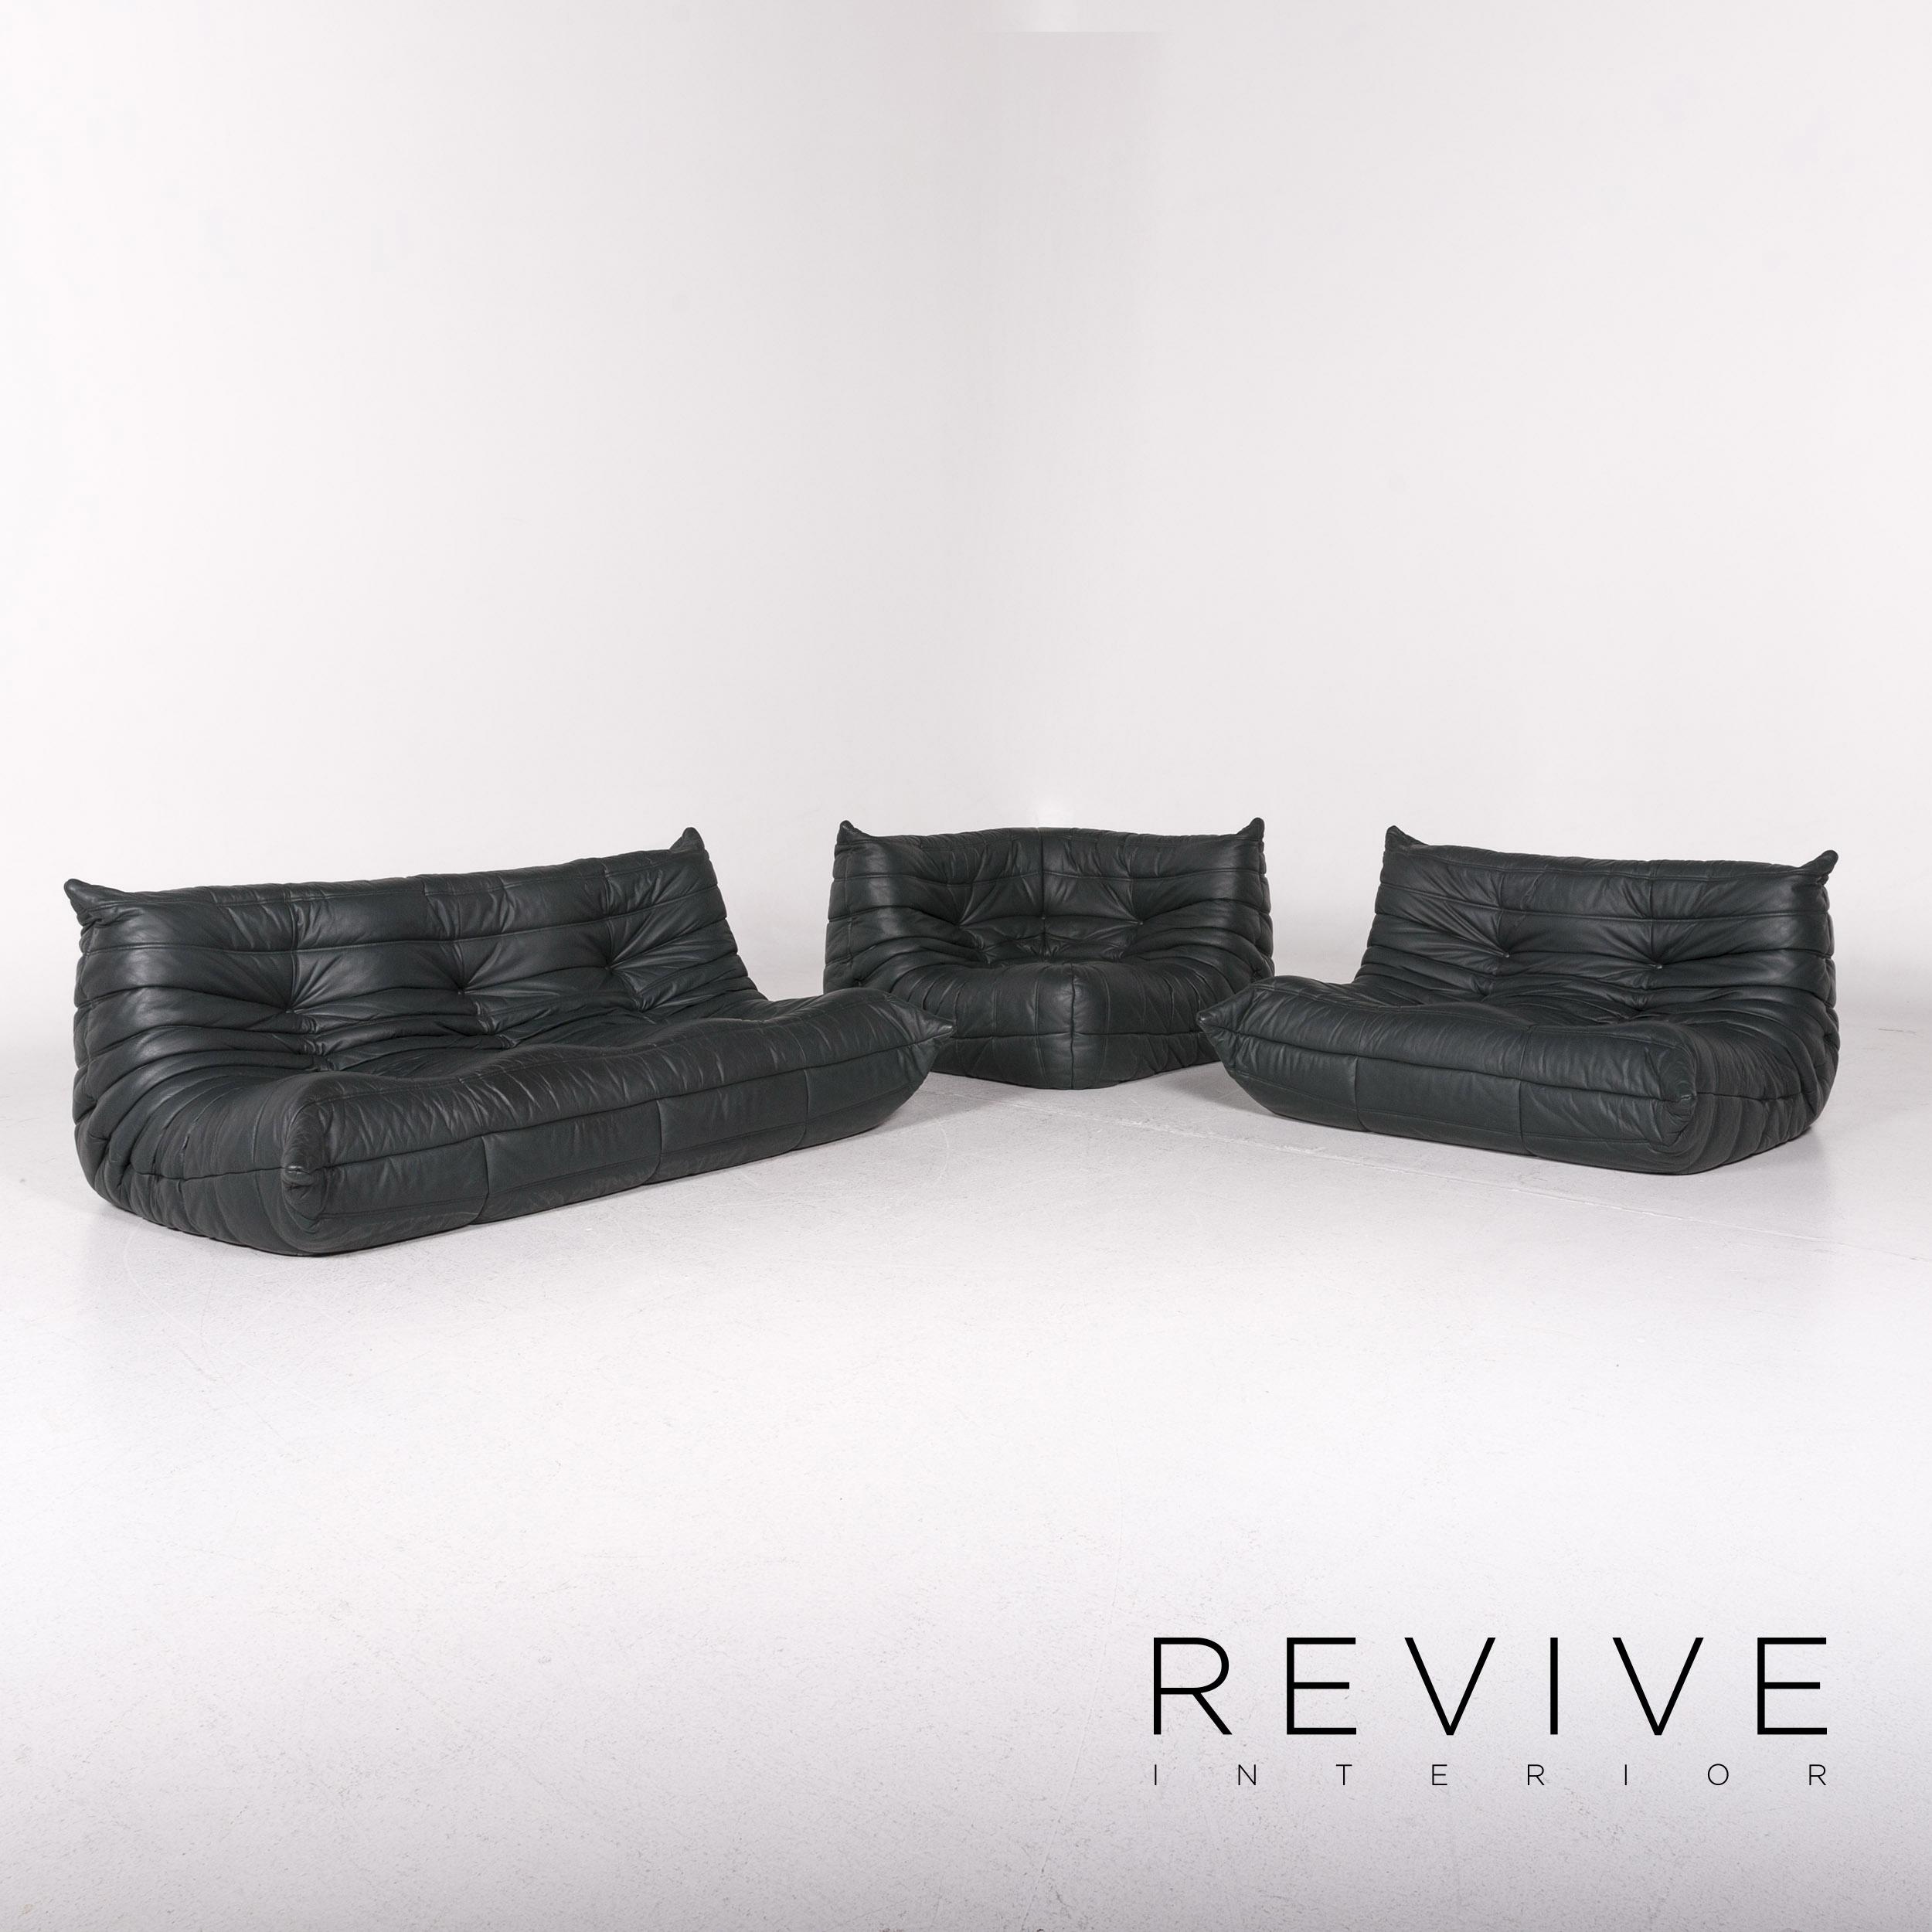 Full Size of Vintage Togo Sofa Australia Dimensions Used For Sale Couch Gebraucht Leather Replica Ligne Roset Style Uk Kaufen Petrol Big Xxl Terassen Lederpflege Bullfrog Sofa Togo Sofa